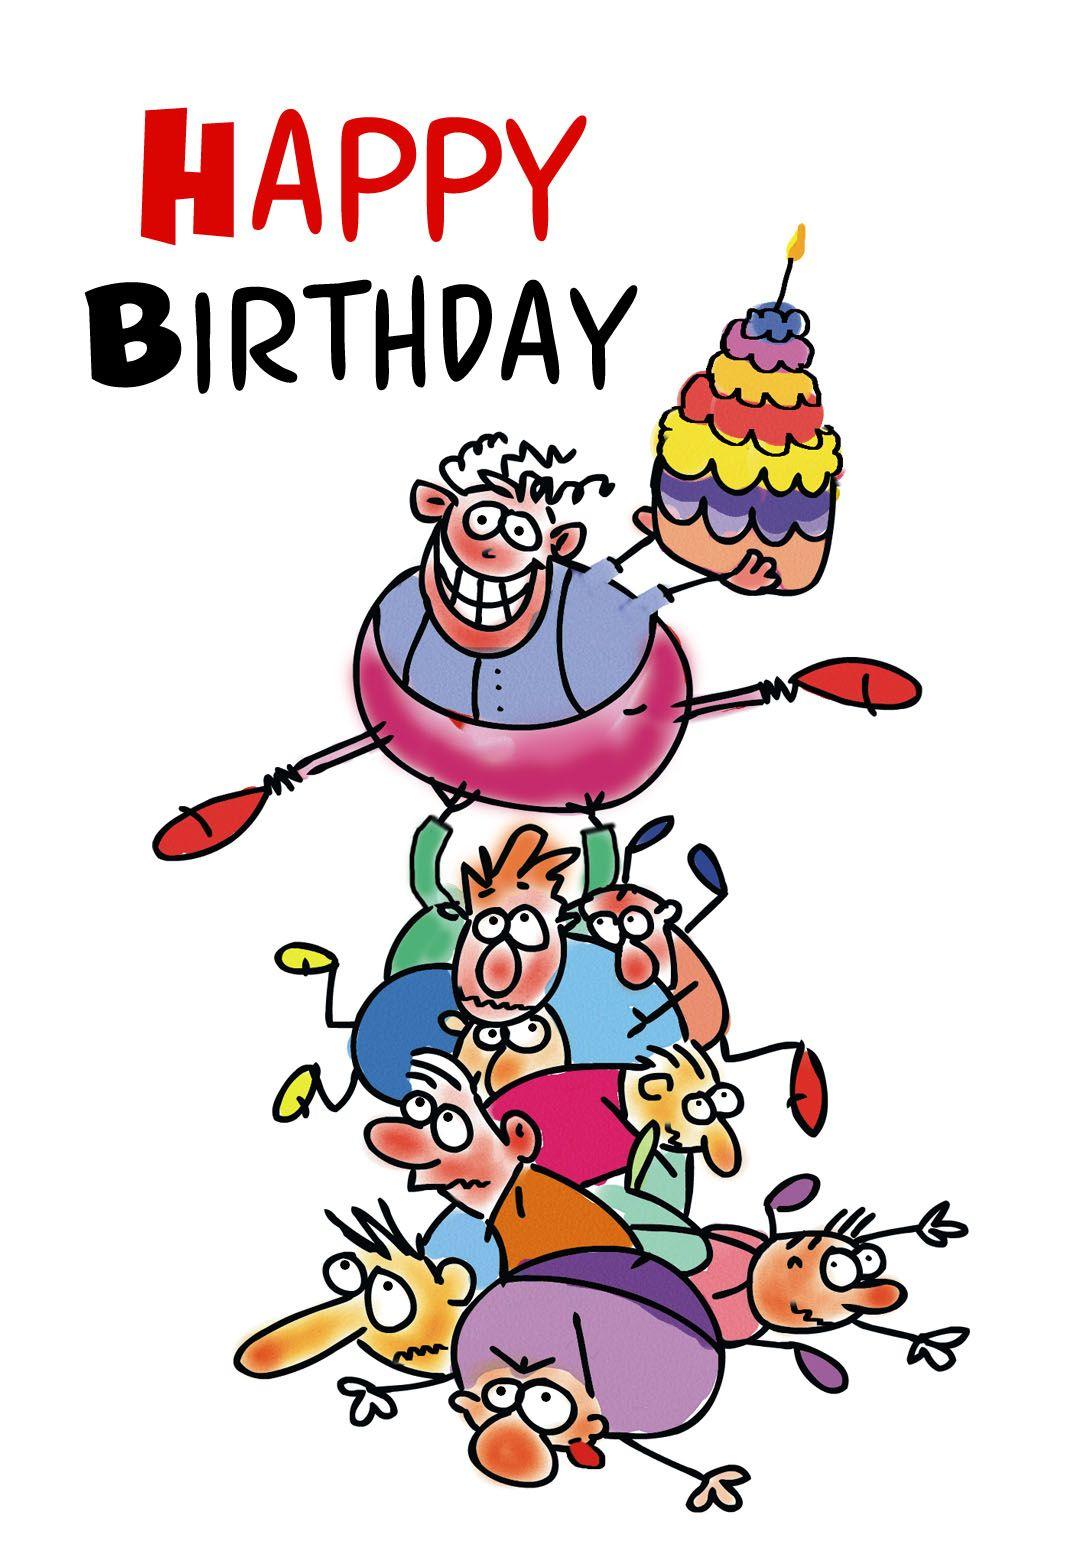 Free Printable Funny Birthday Greeting Card   Gifts To Make   Free - Free Printable Funny Birthday Cards